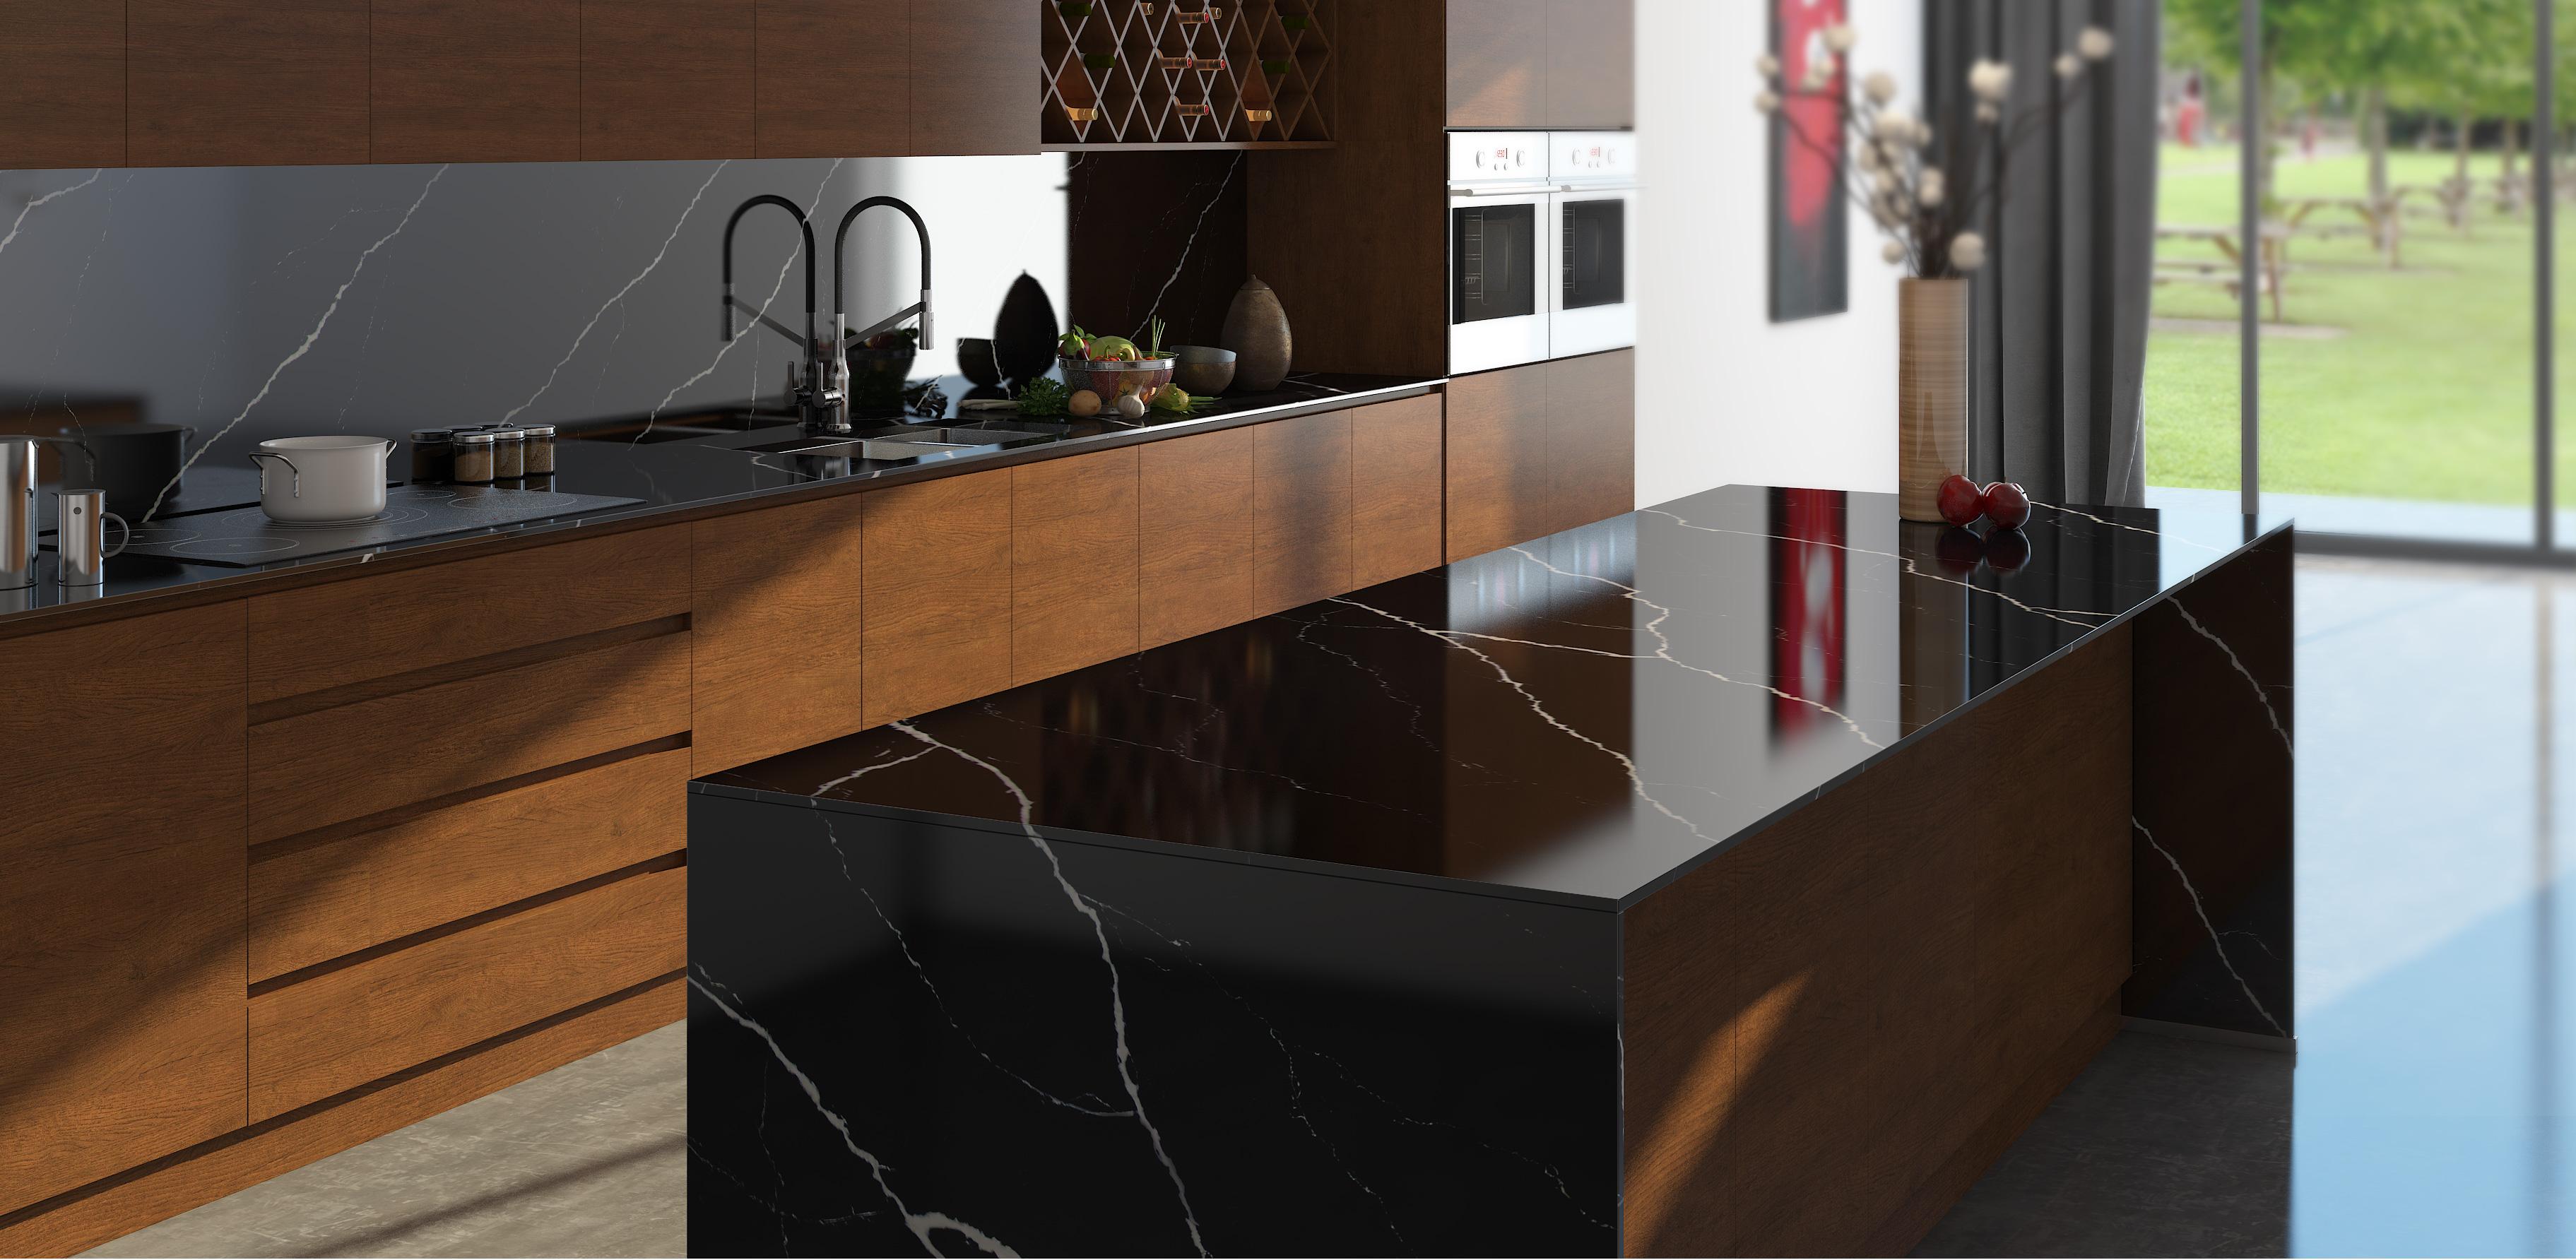 Vicostone Kitchen Countertops Quartz Surfaces Quartz